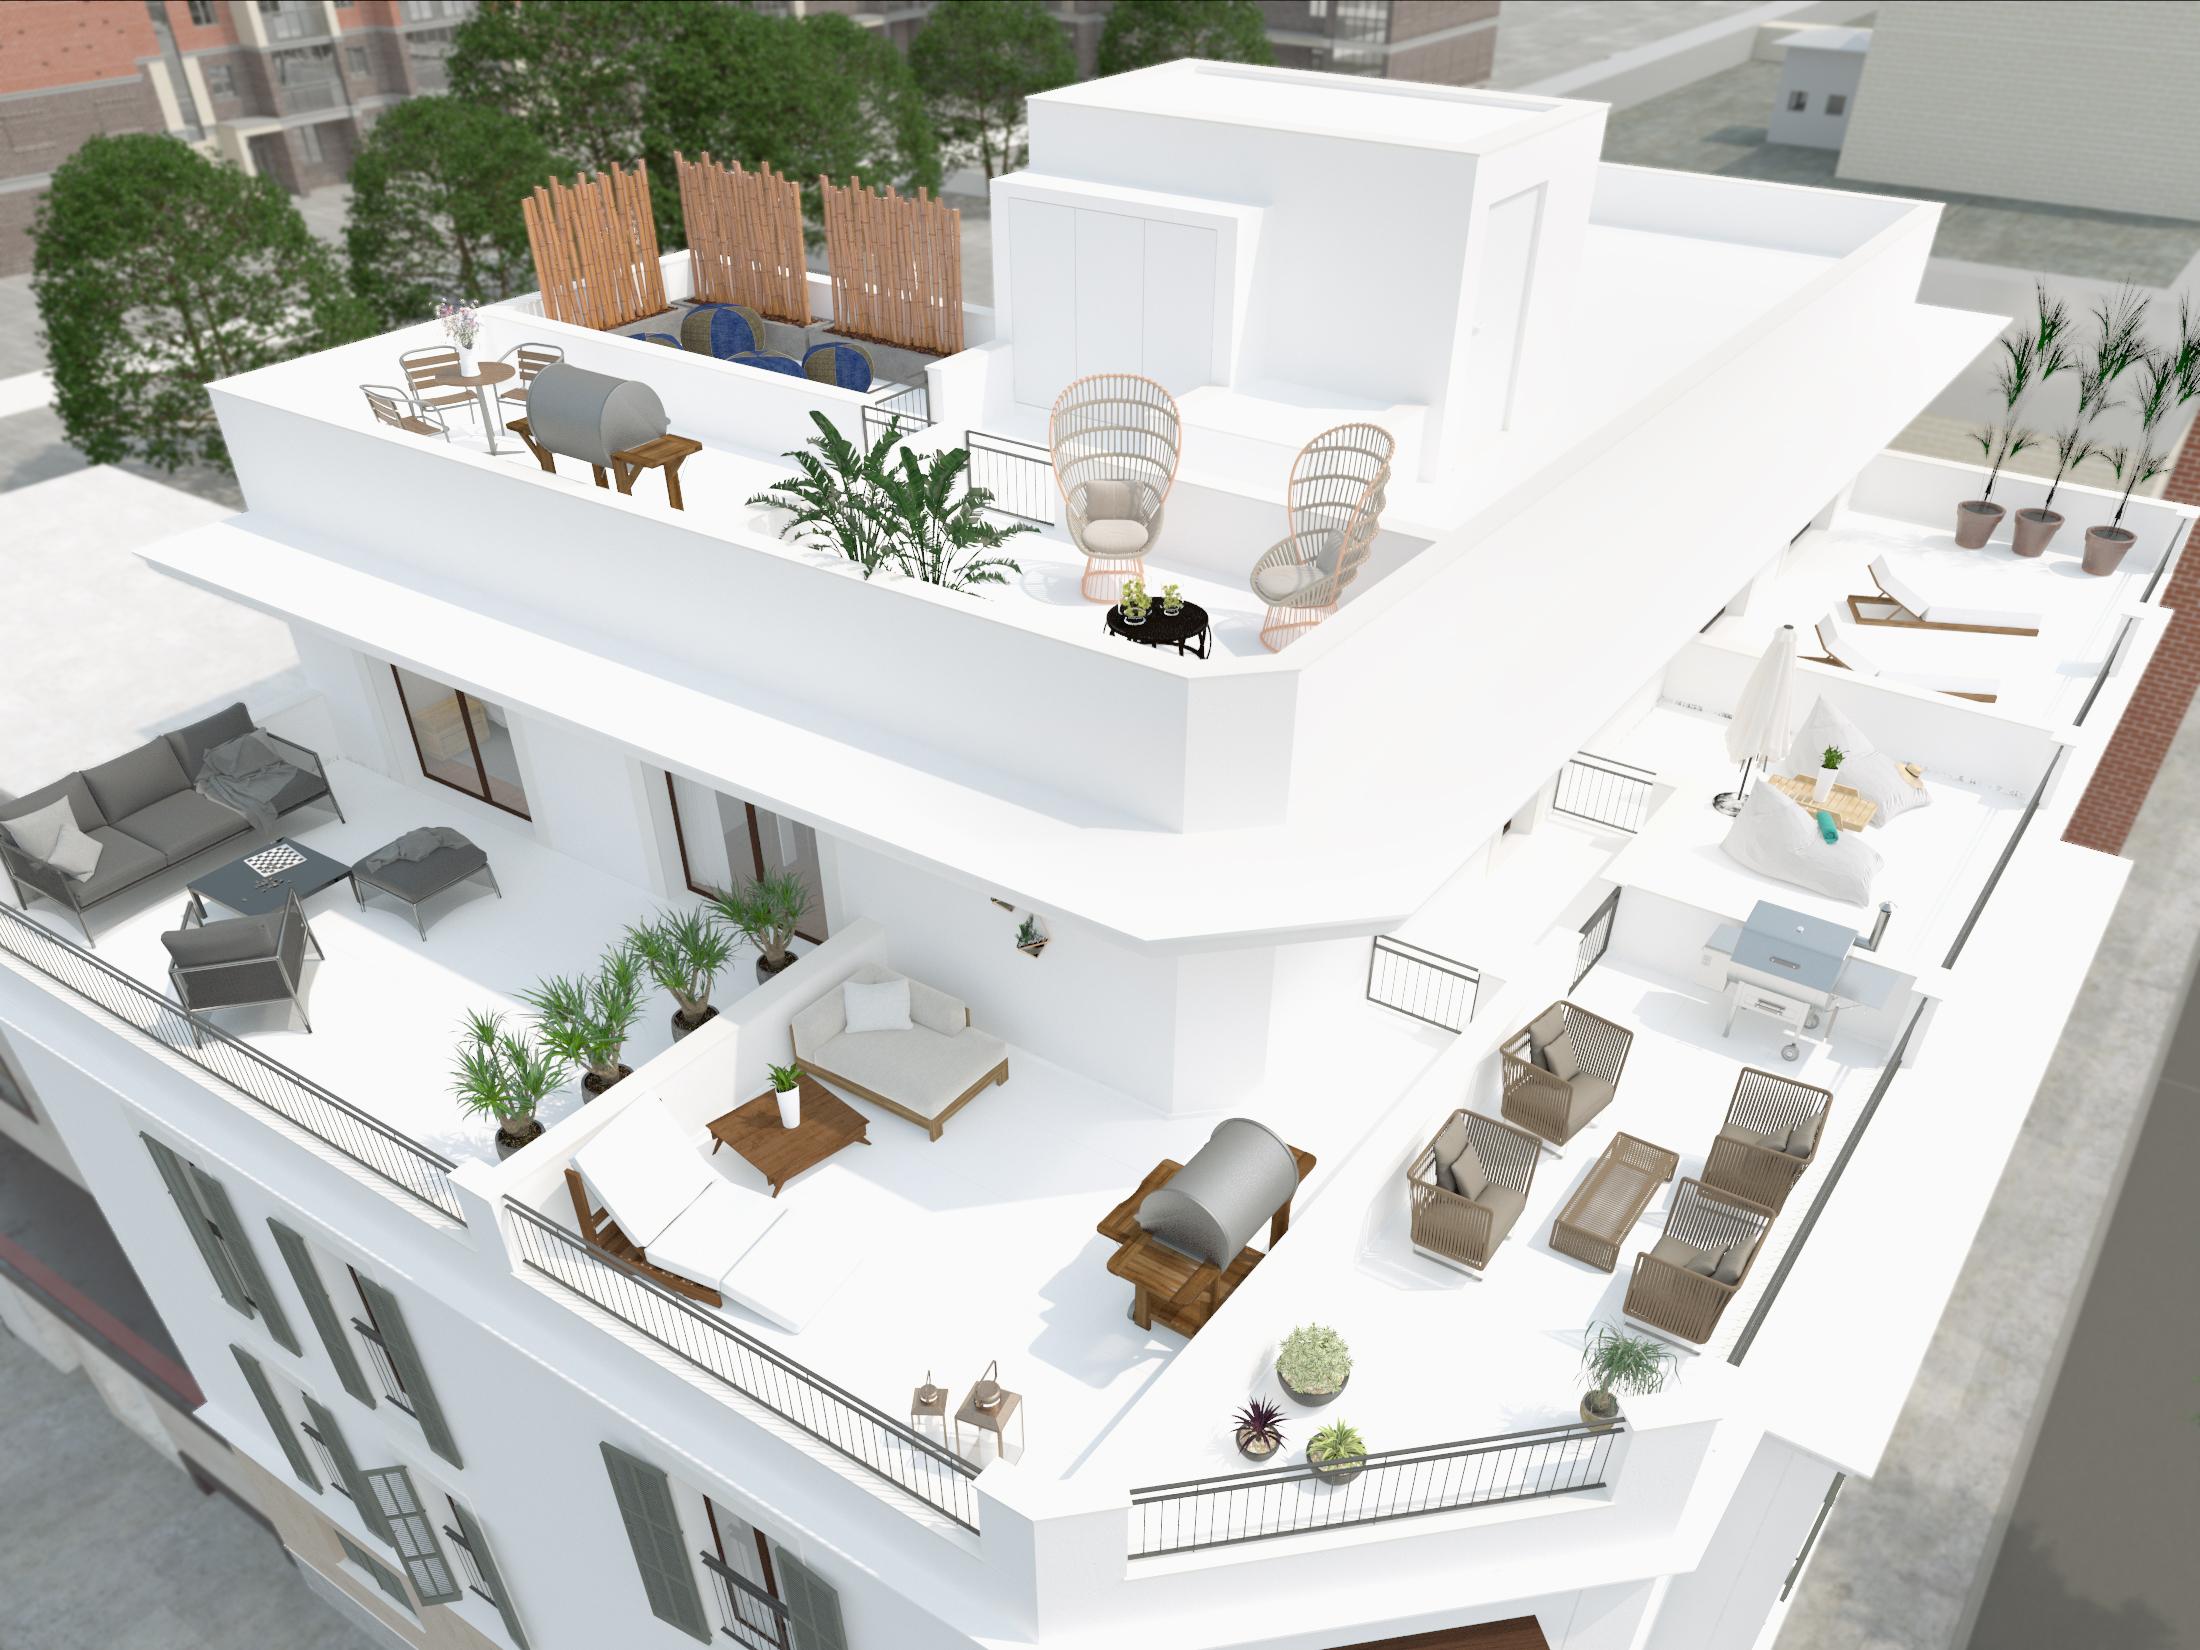 Dachterrassen Wohngebäude Palma